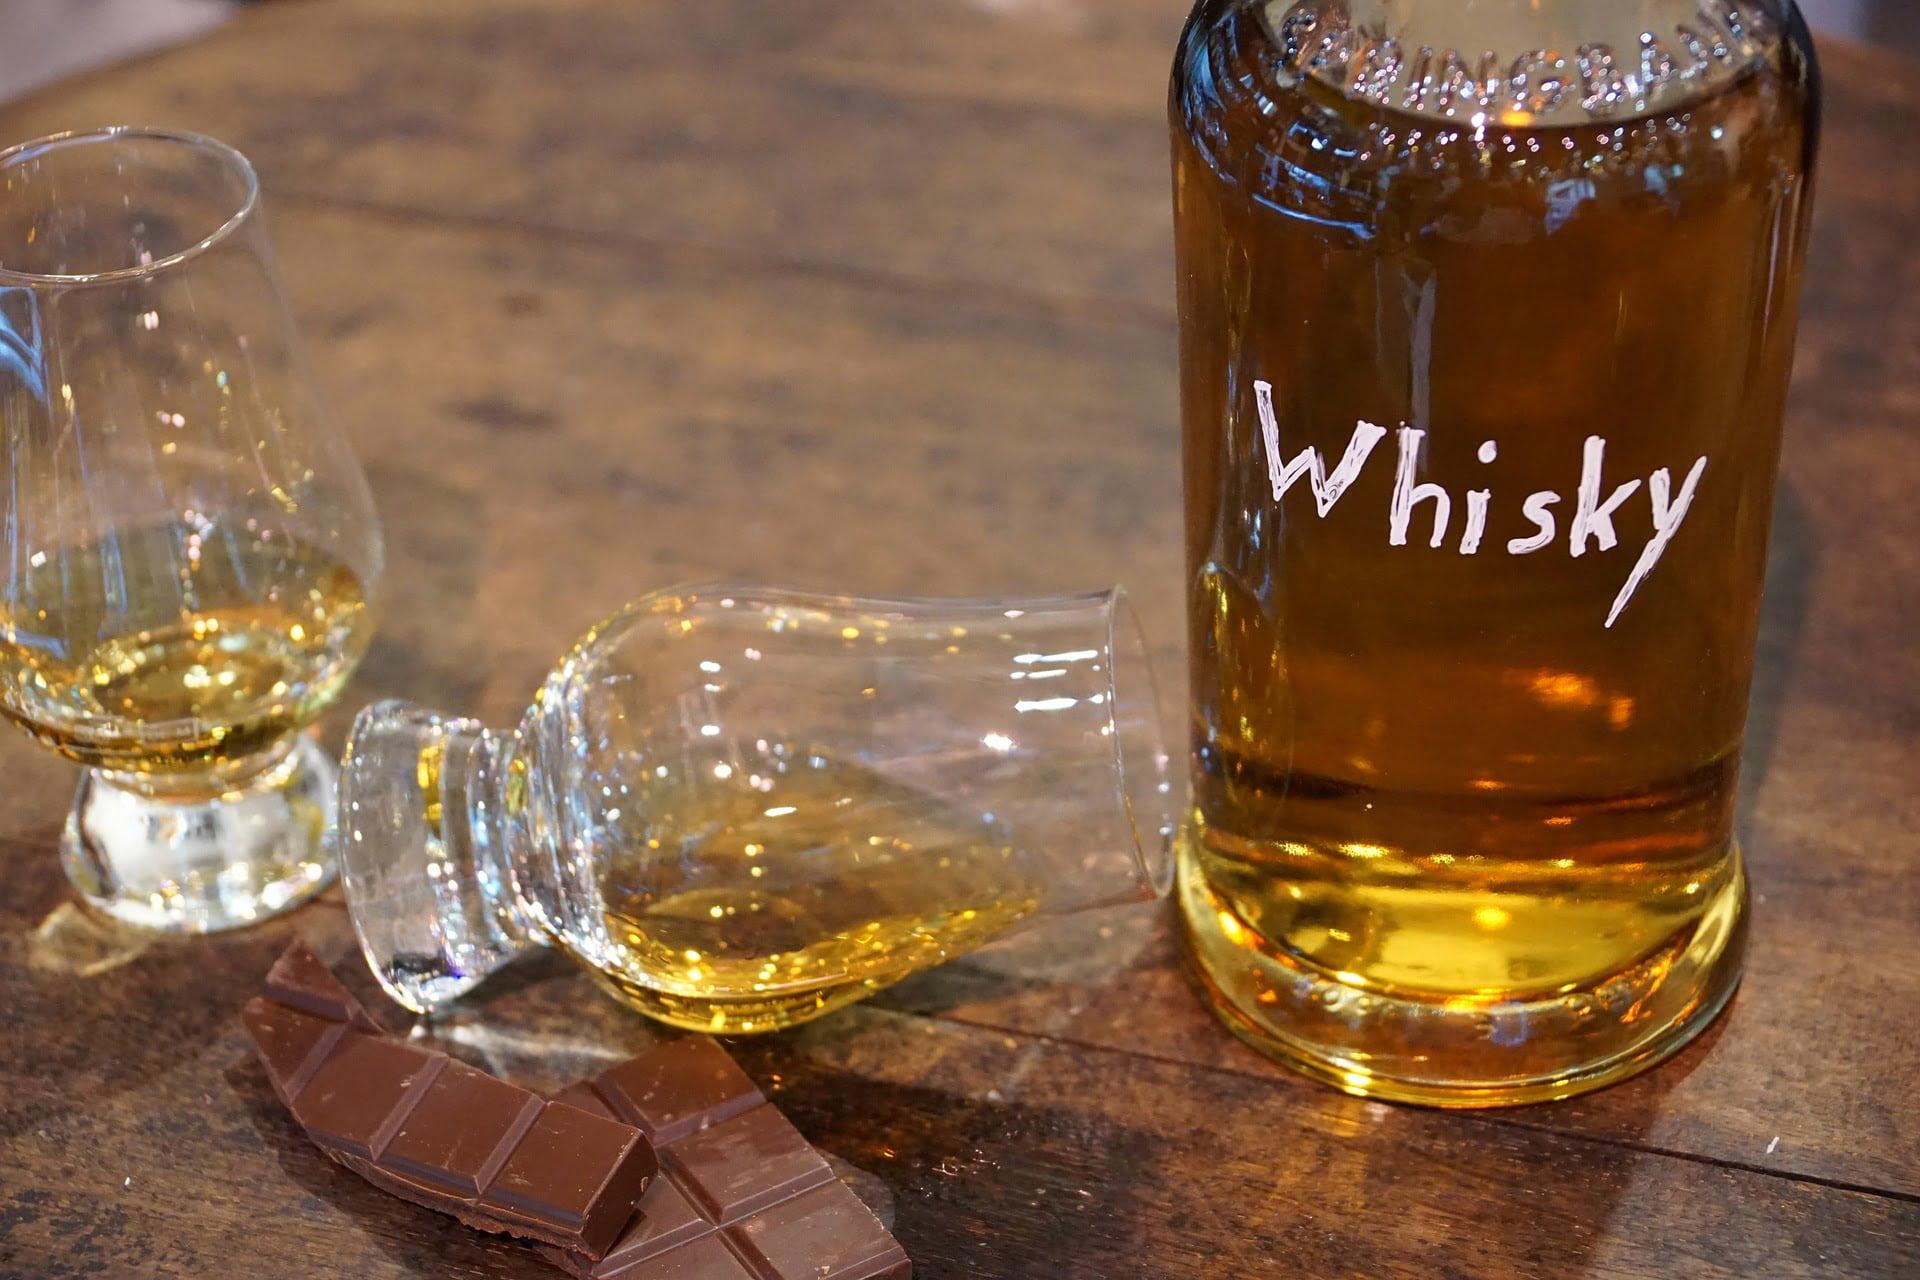 Hobi amaçlı evde viski yapımı